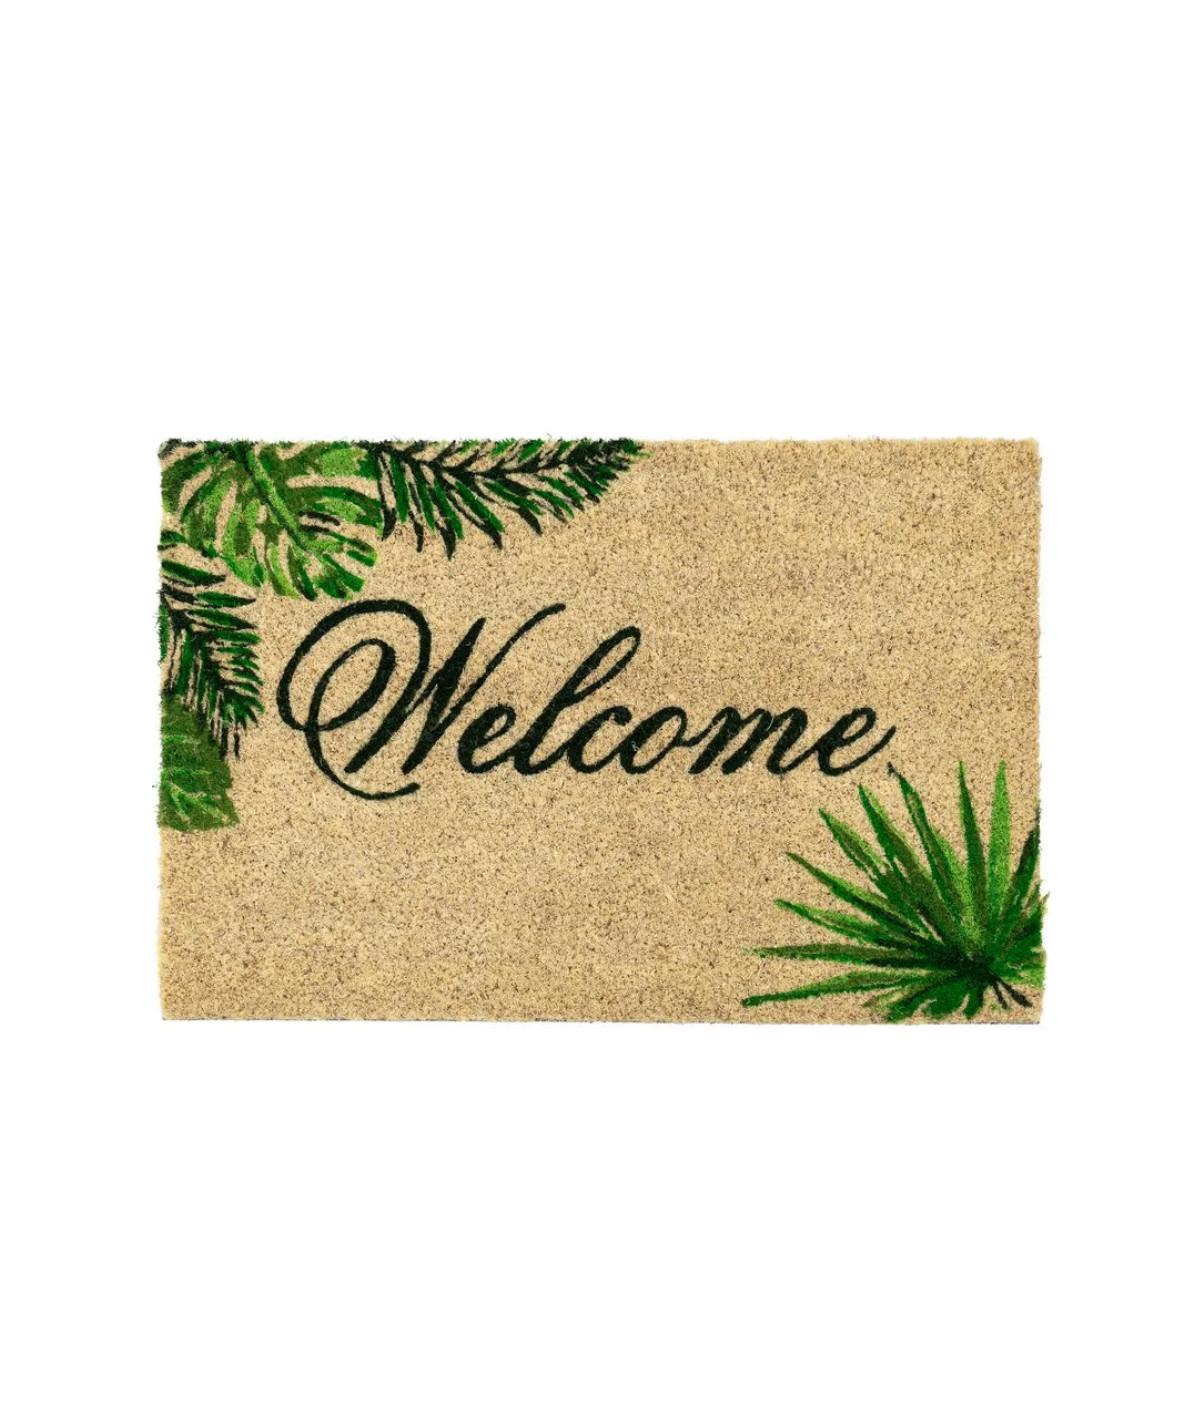 Paillasson coco 60x40cm - Jungle welcome |YESDEKO